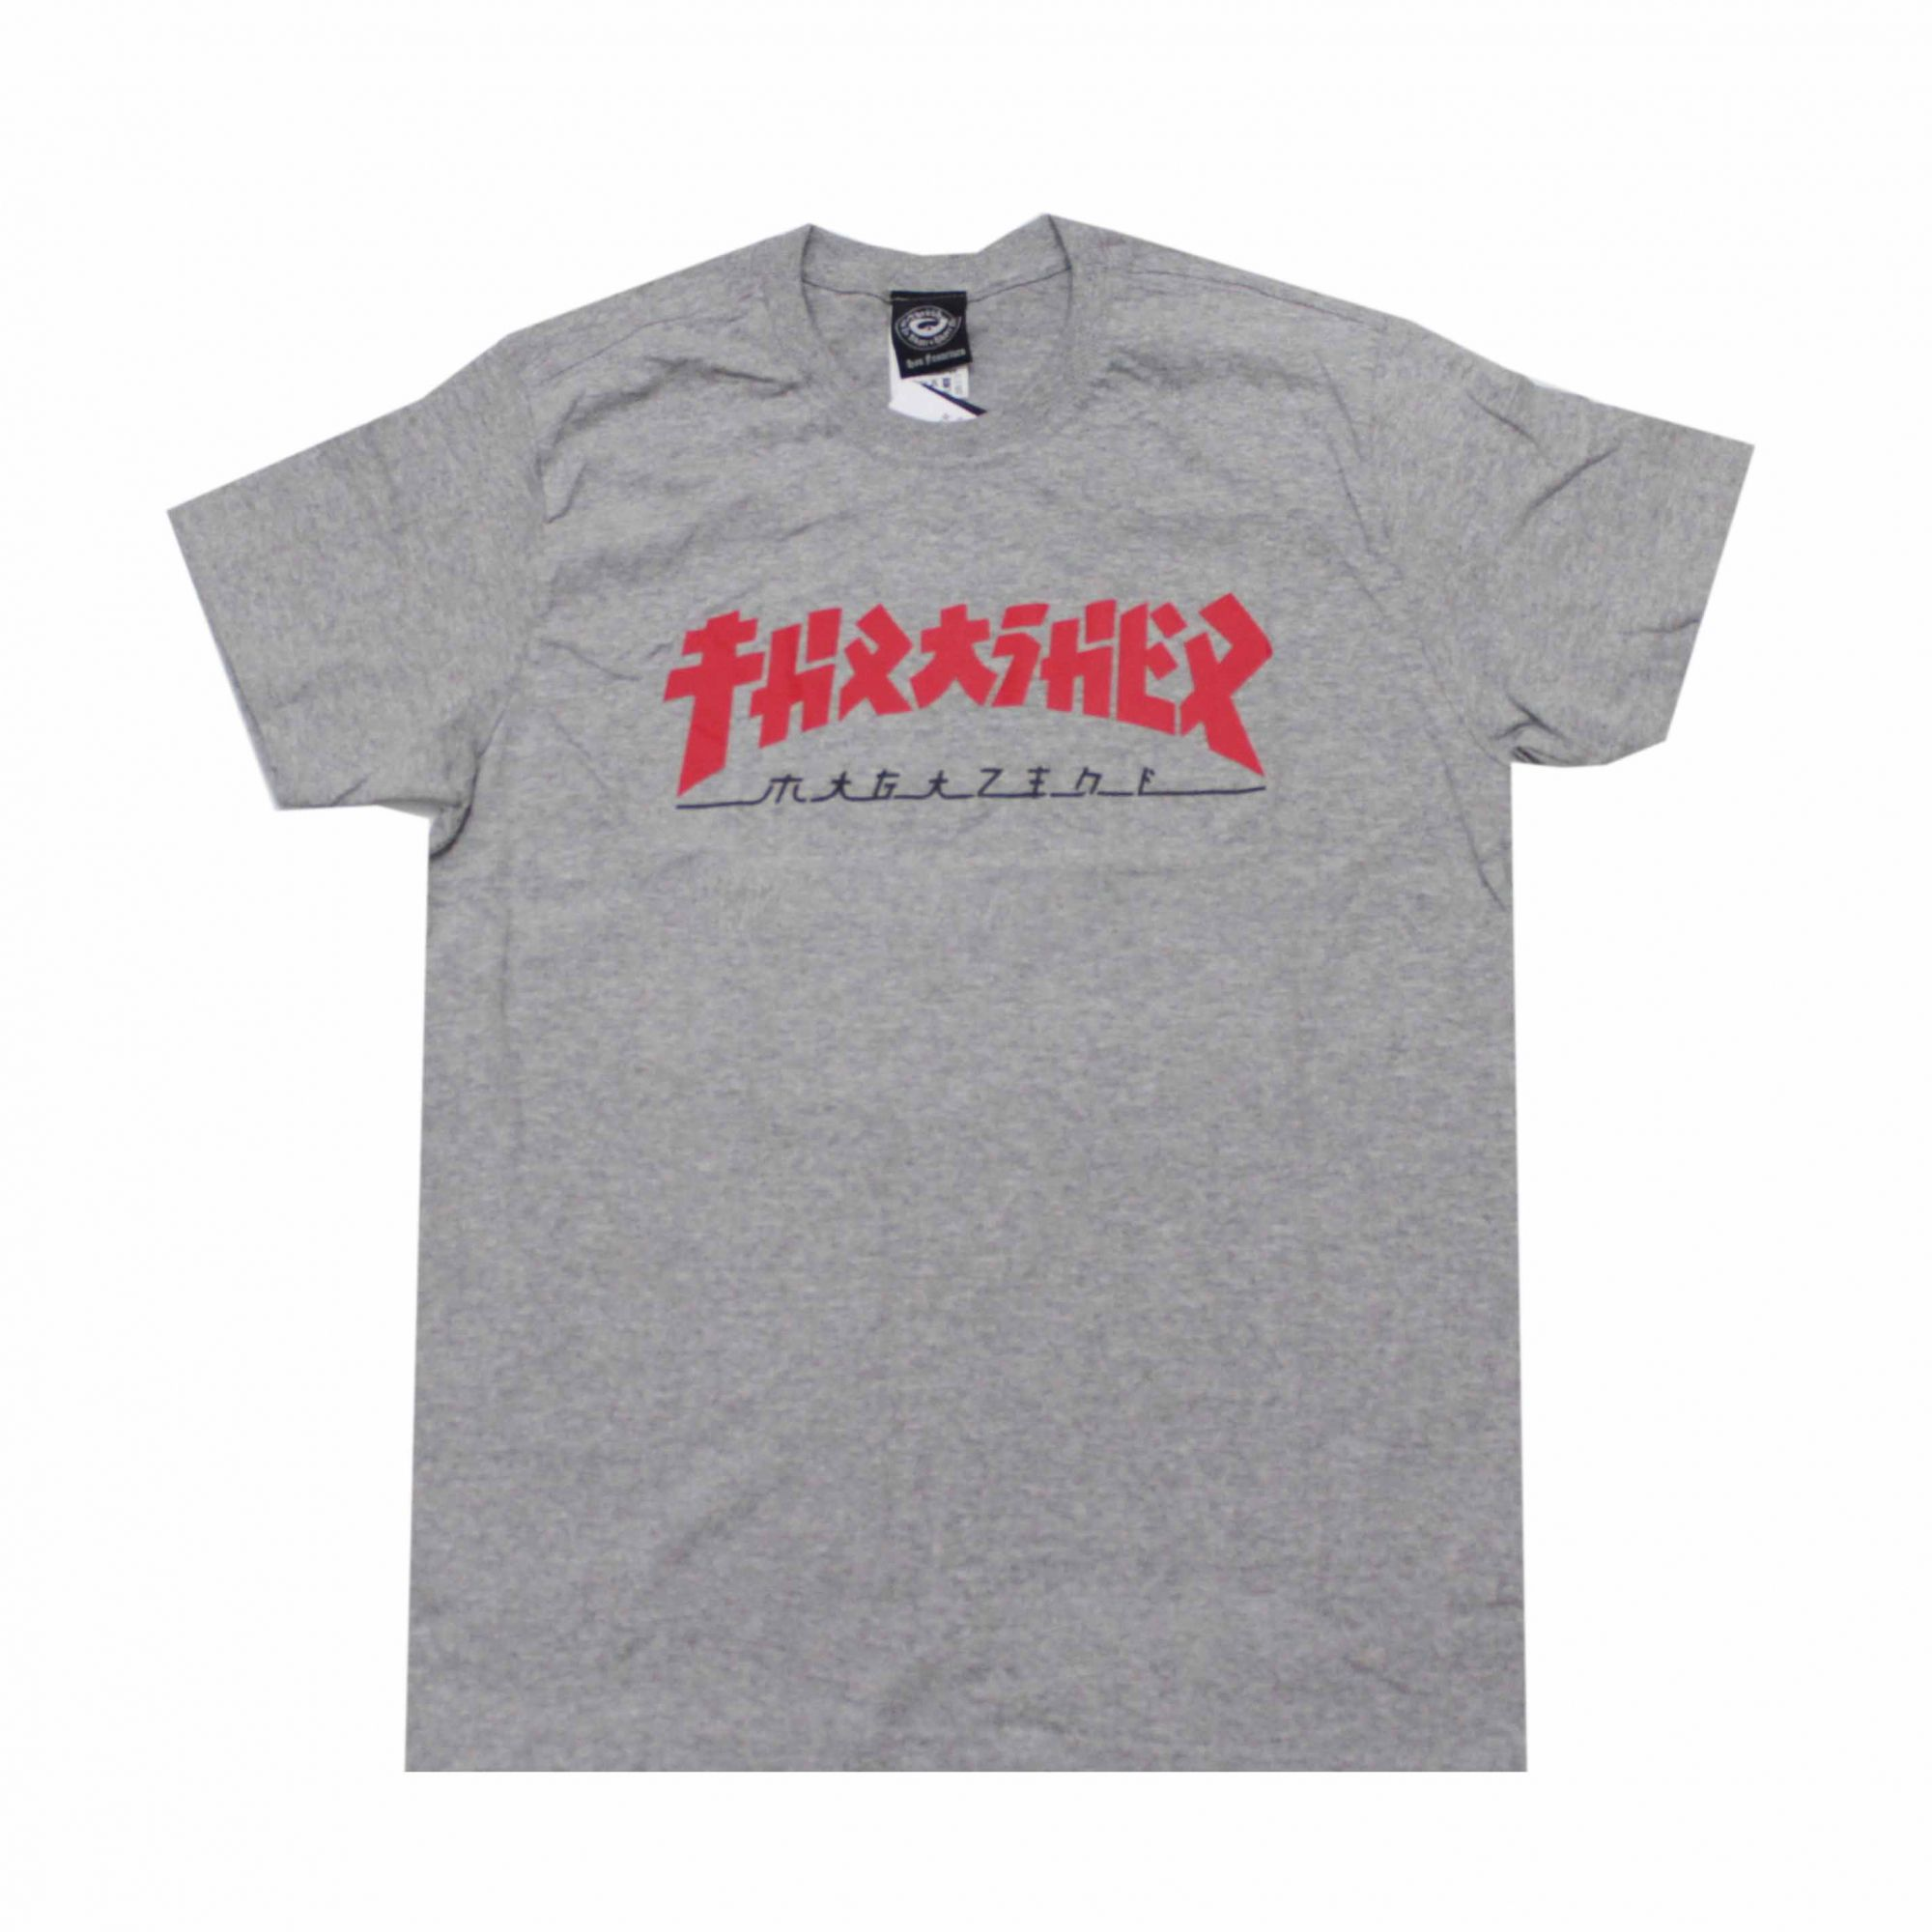 Camiseta Thrasher Magazine Godzilla Cinza Mescla